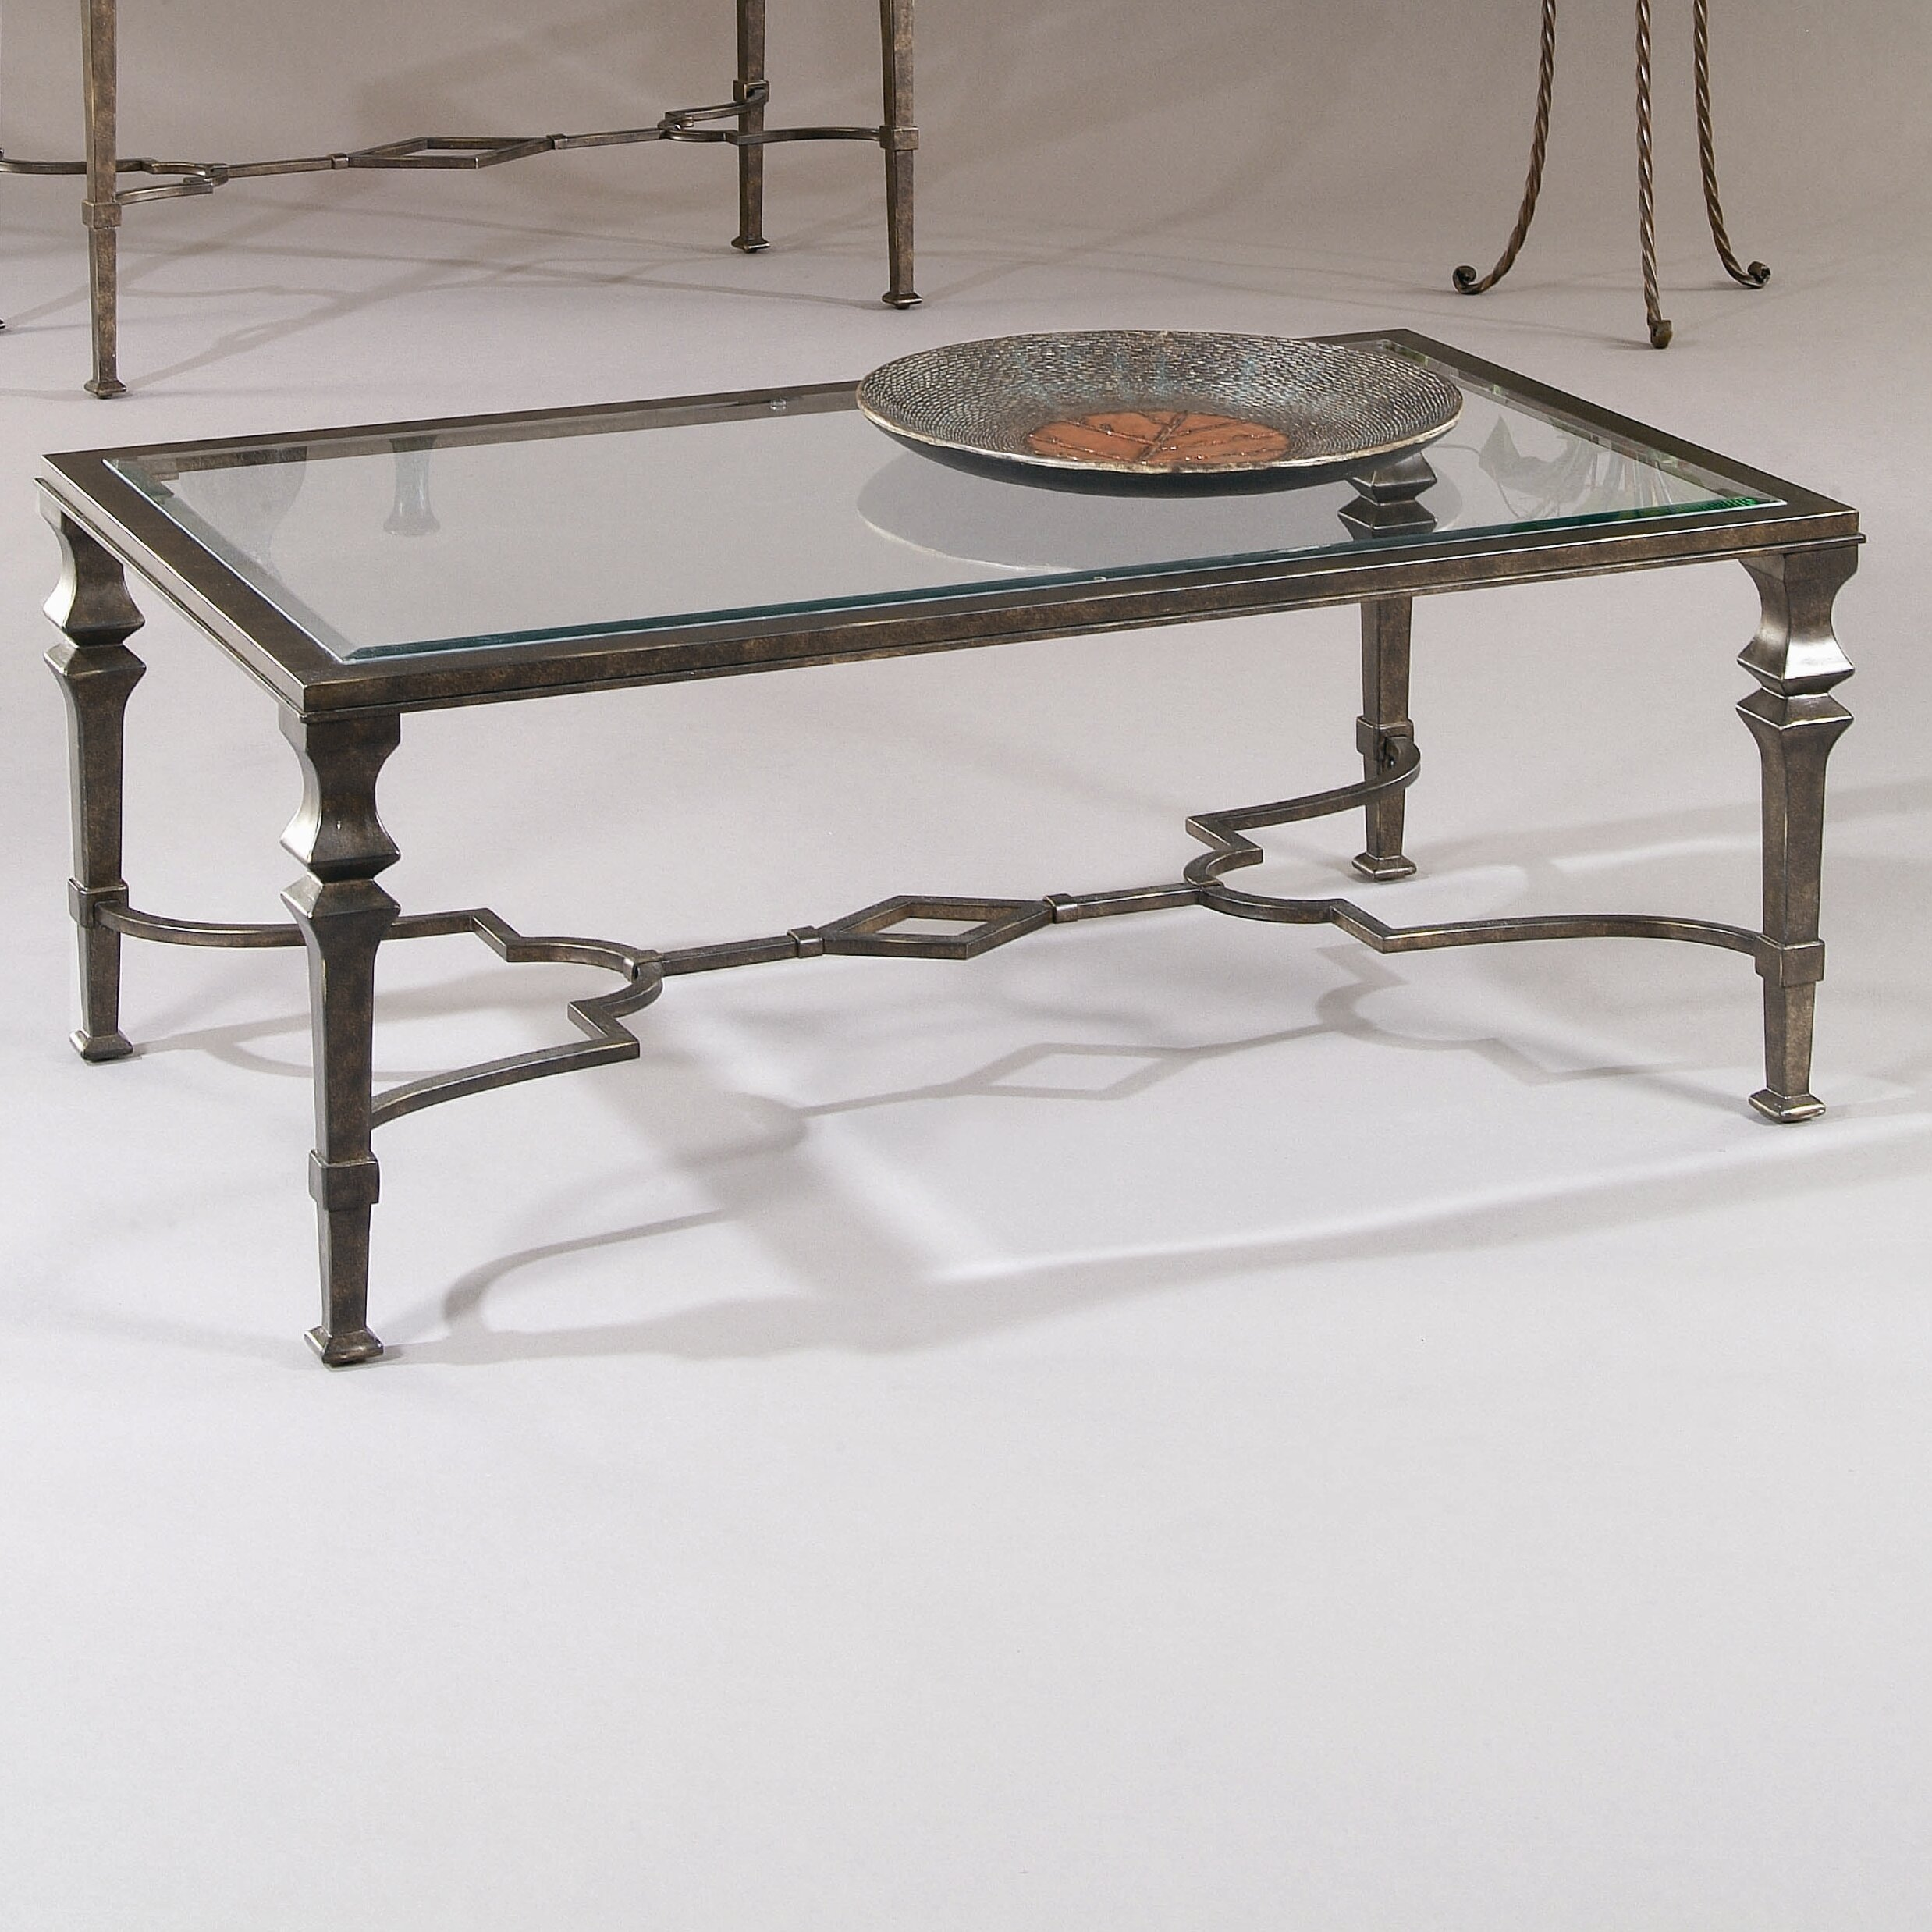 bassett mirror lido coffee table reviews wayfair. Black Bedroom Furniture Sets. Home Design Ideas